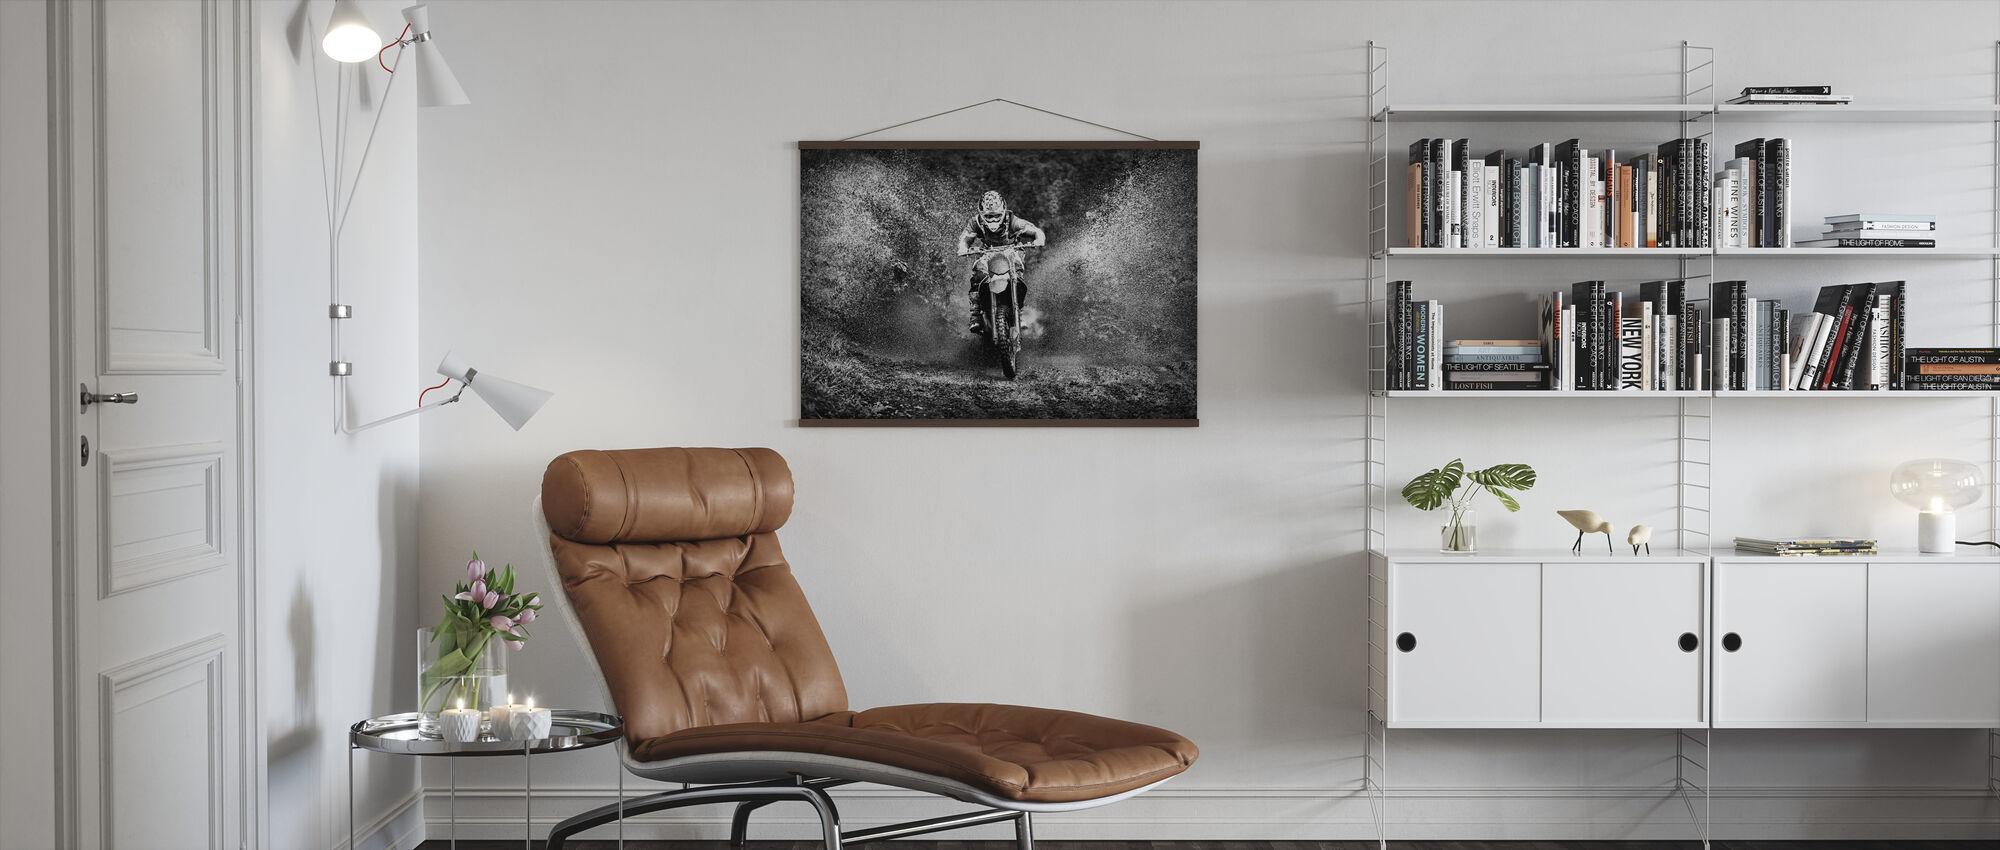 Spray Mud Motorfiets, zwart en wit - Poster - Woonkamer